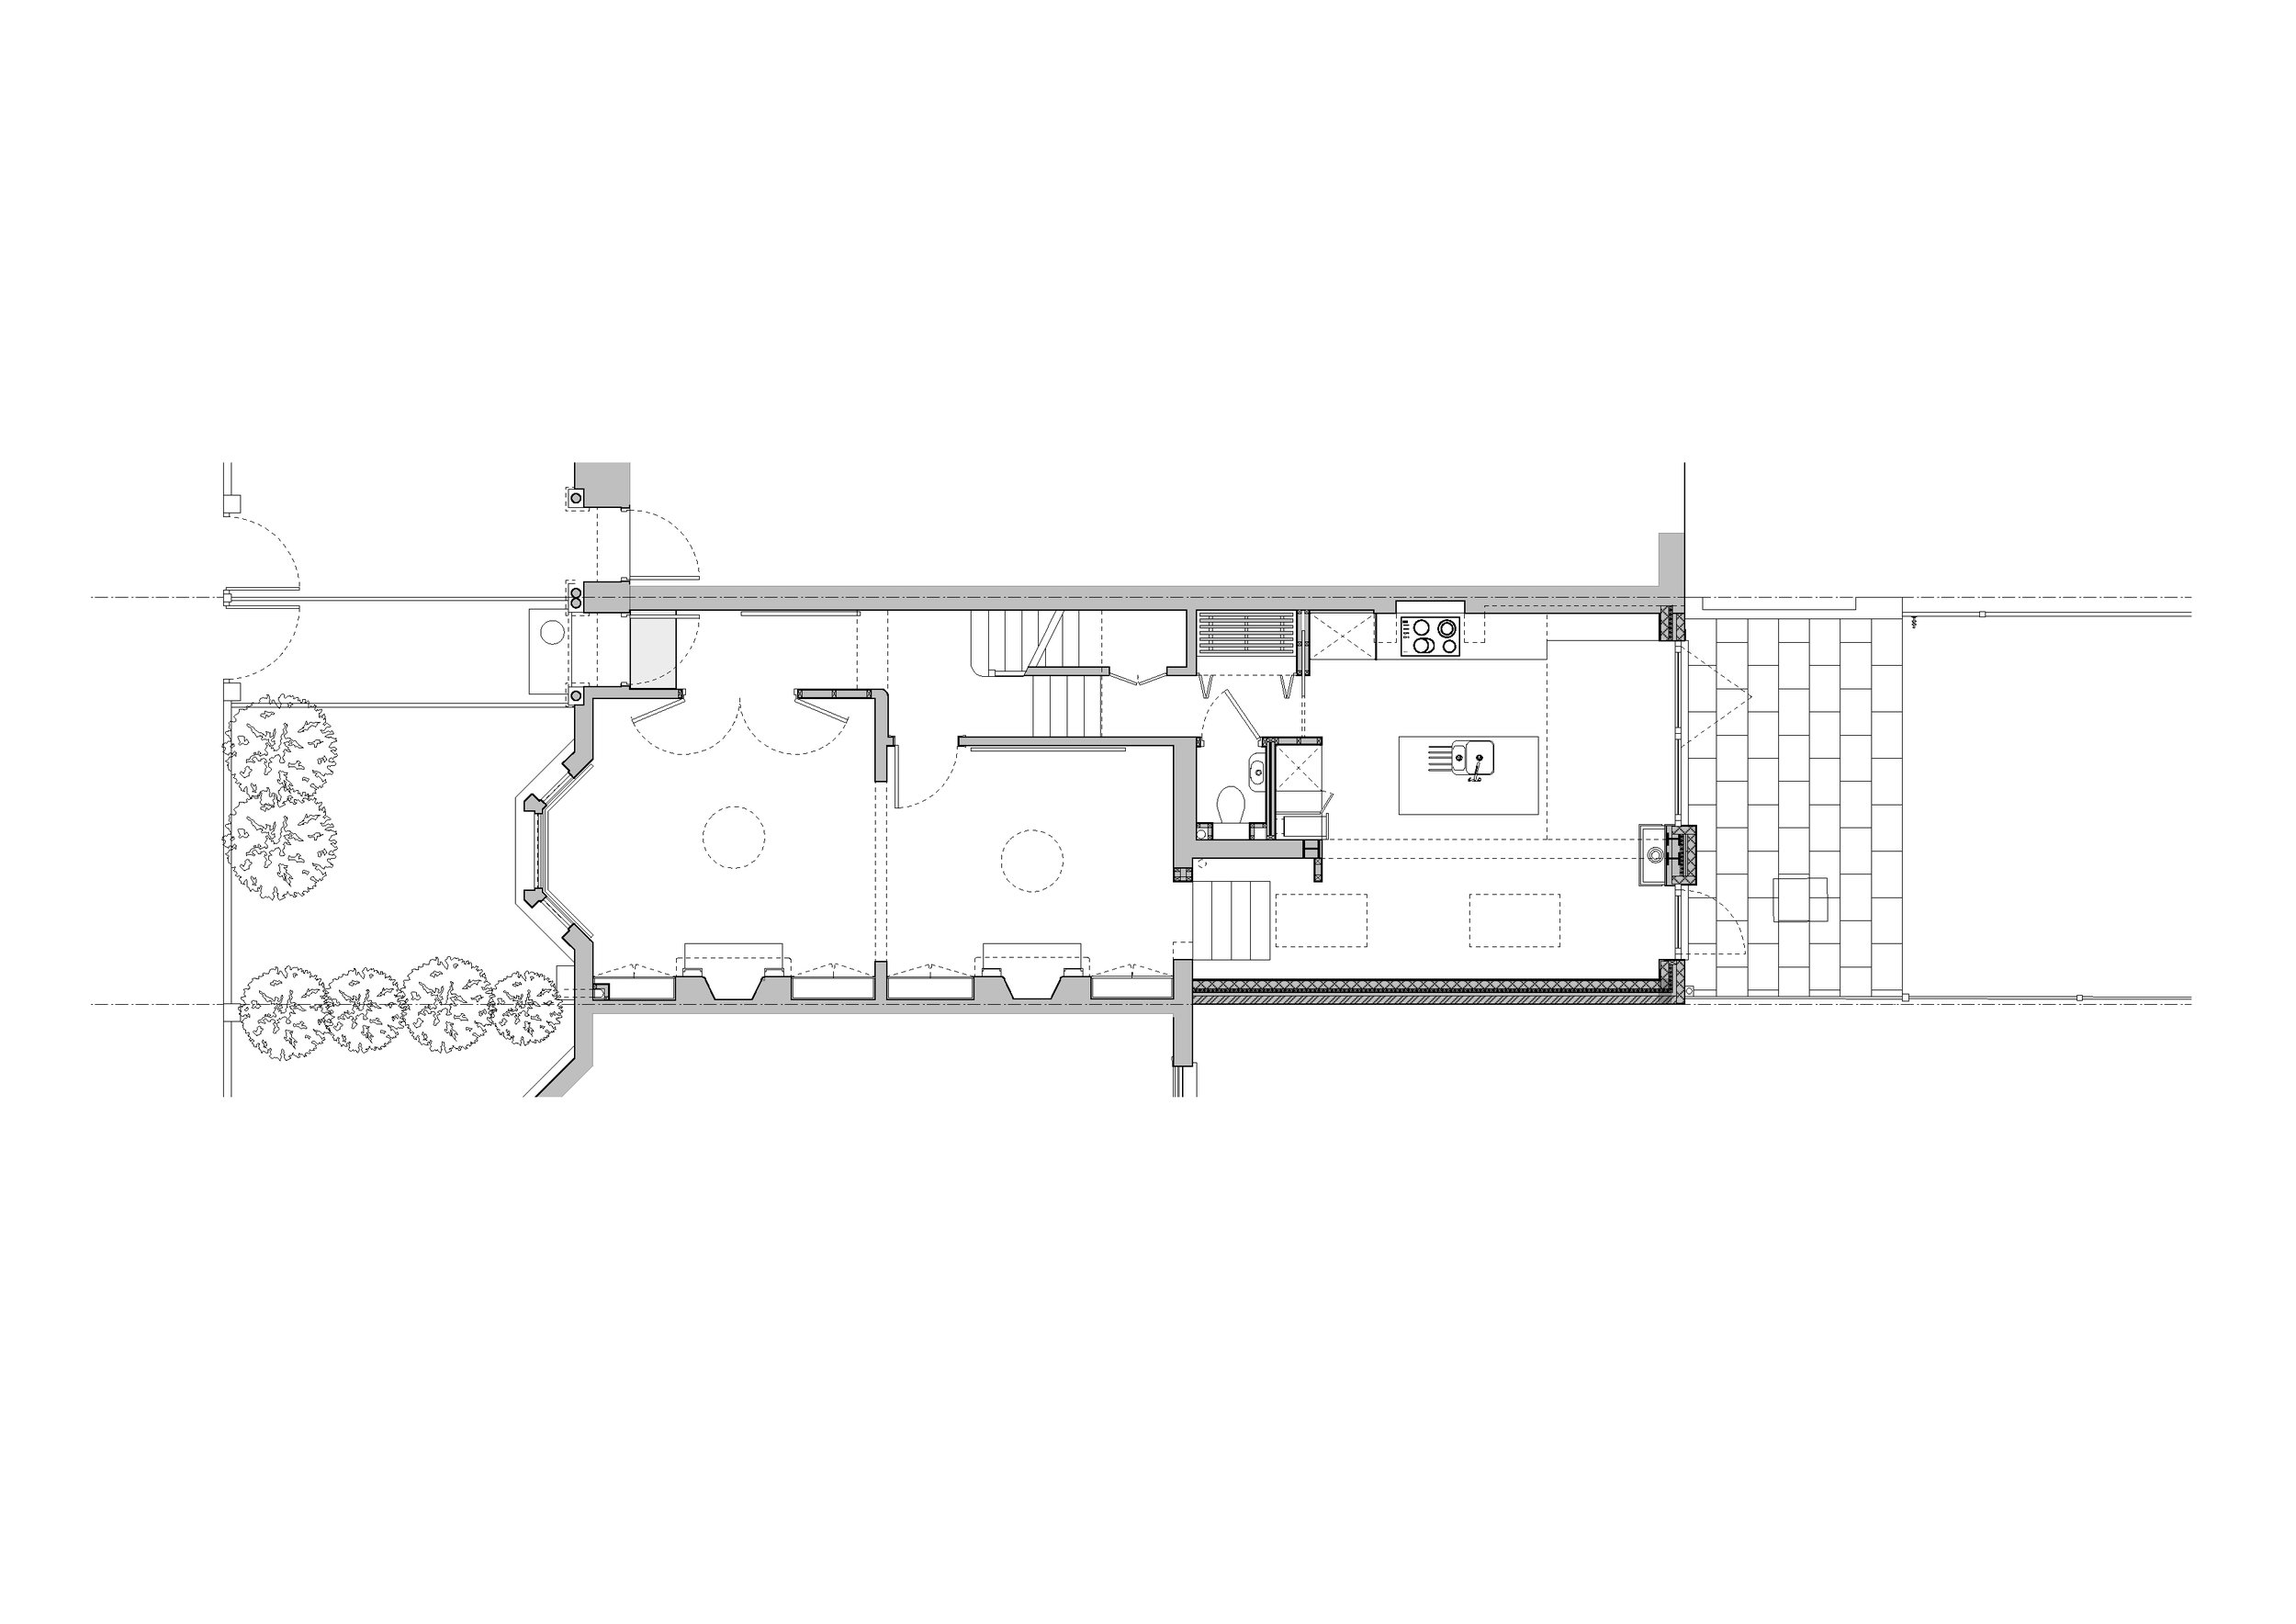 127 Trinder Rd Plan.jpg